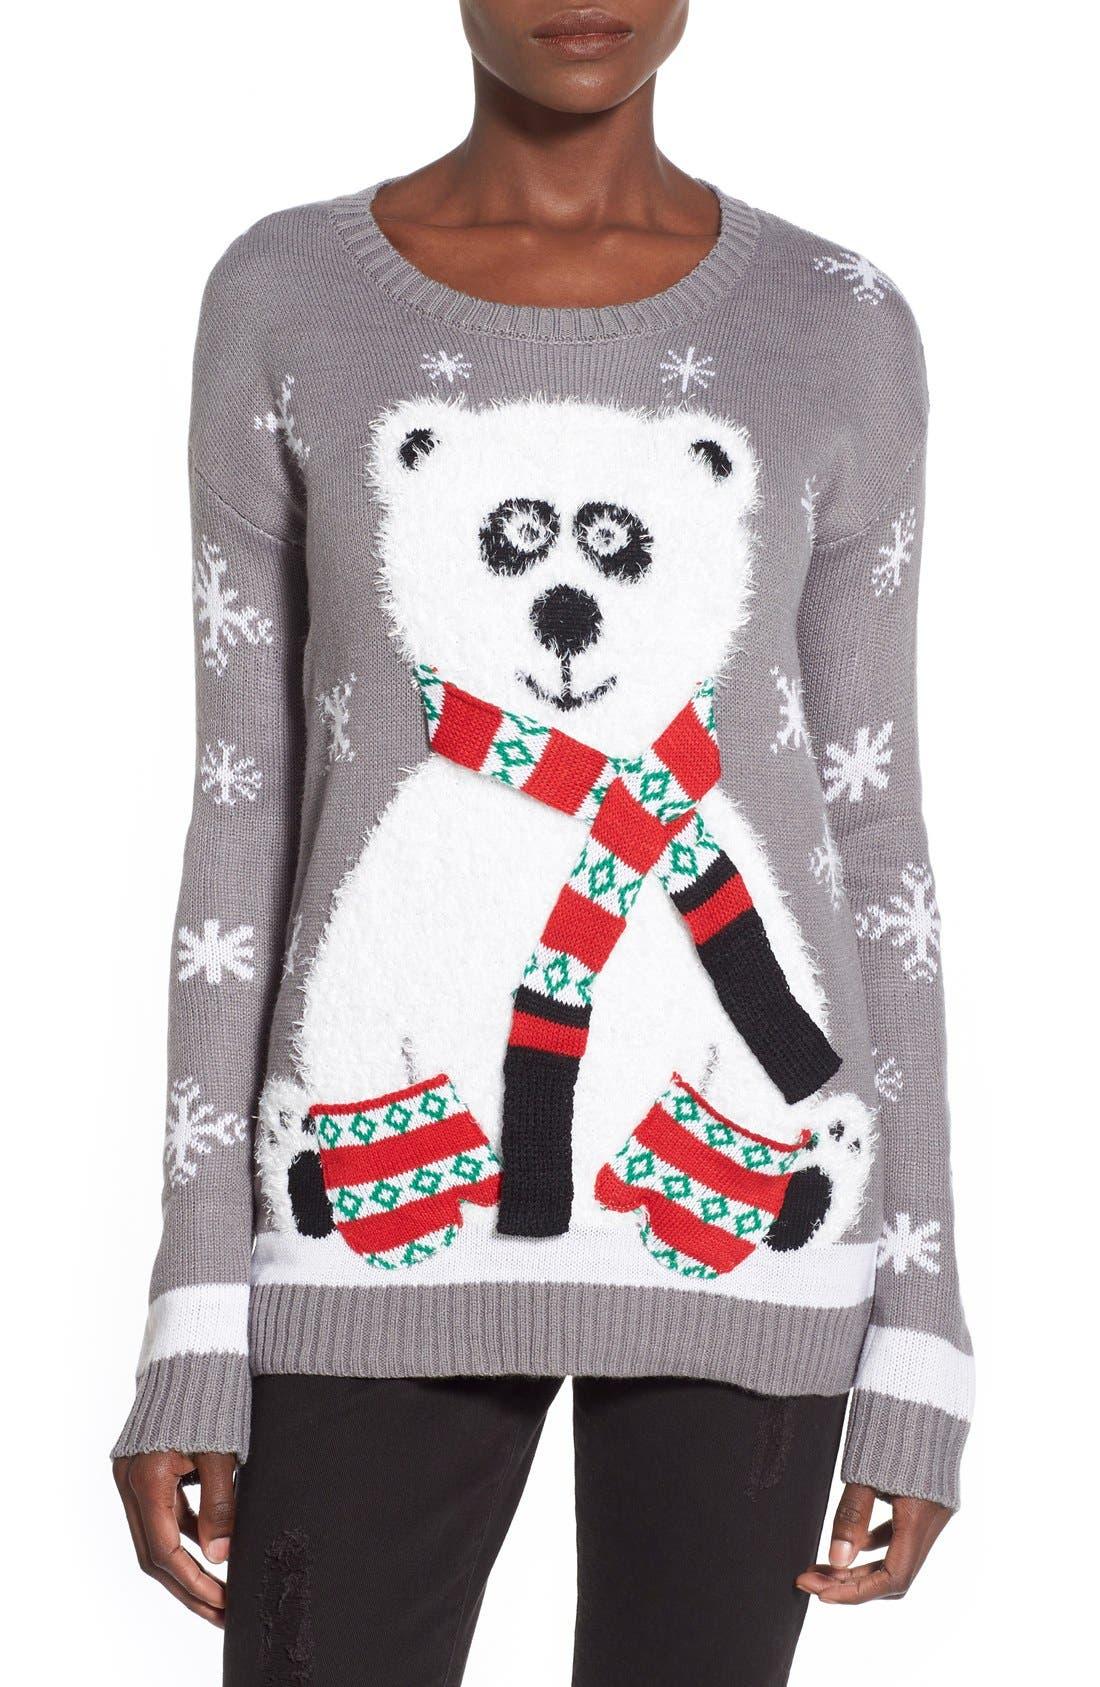 Main Image - Derek Heart Polar Bear Christmas Sweater